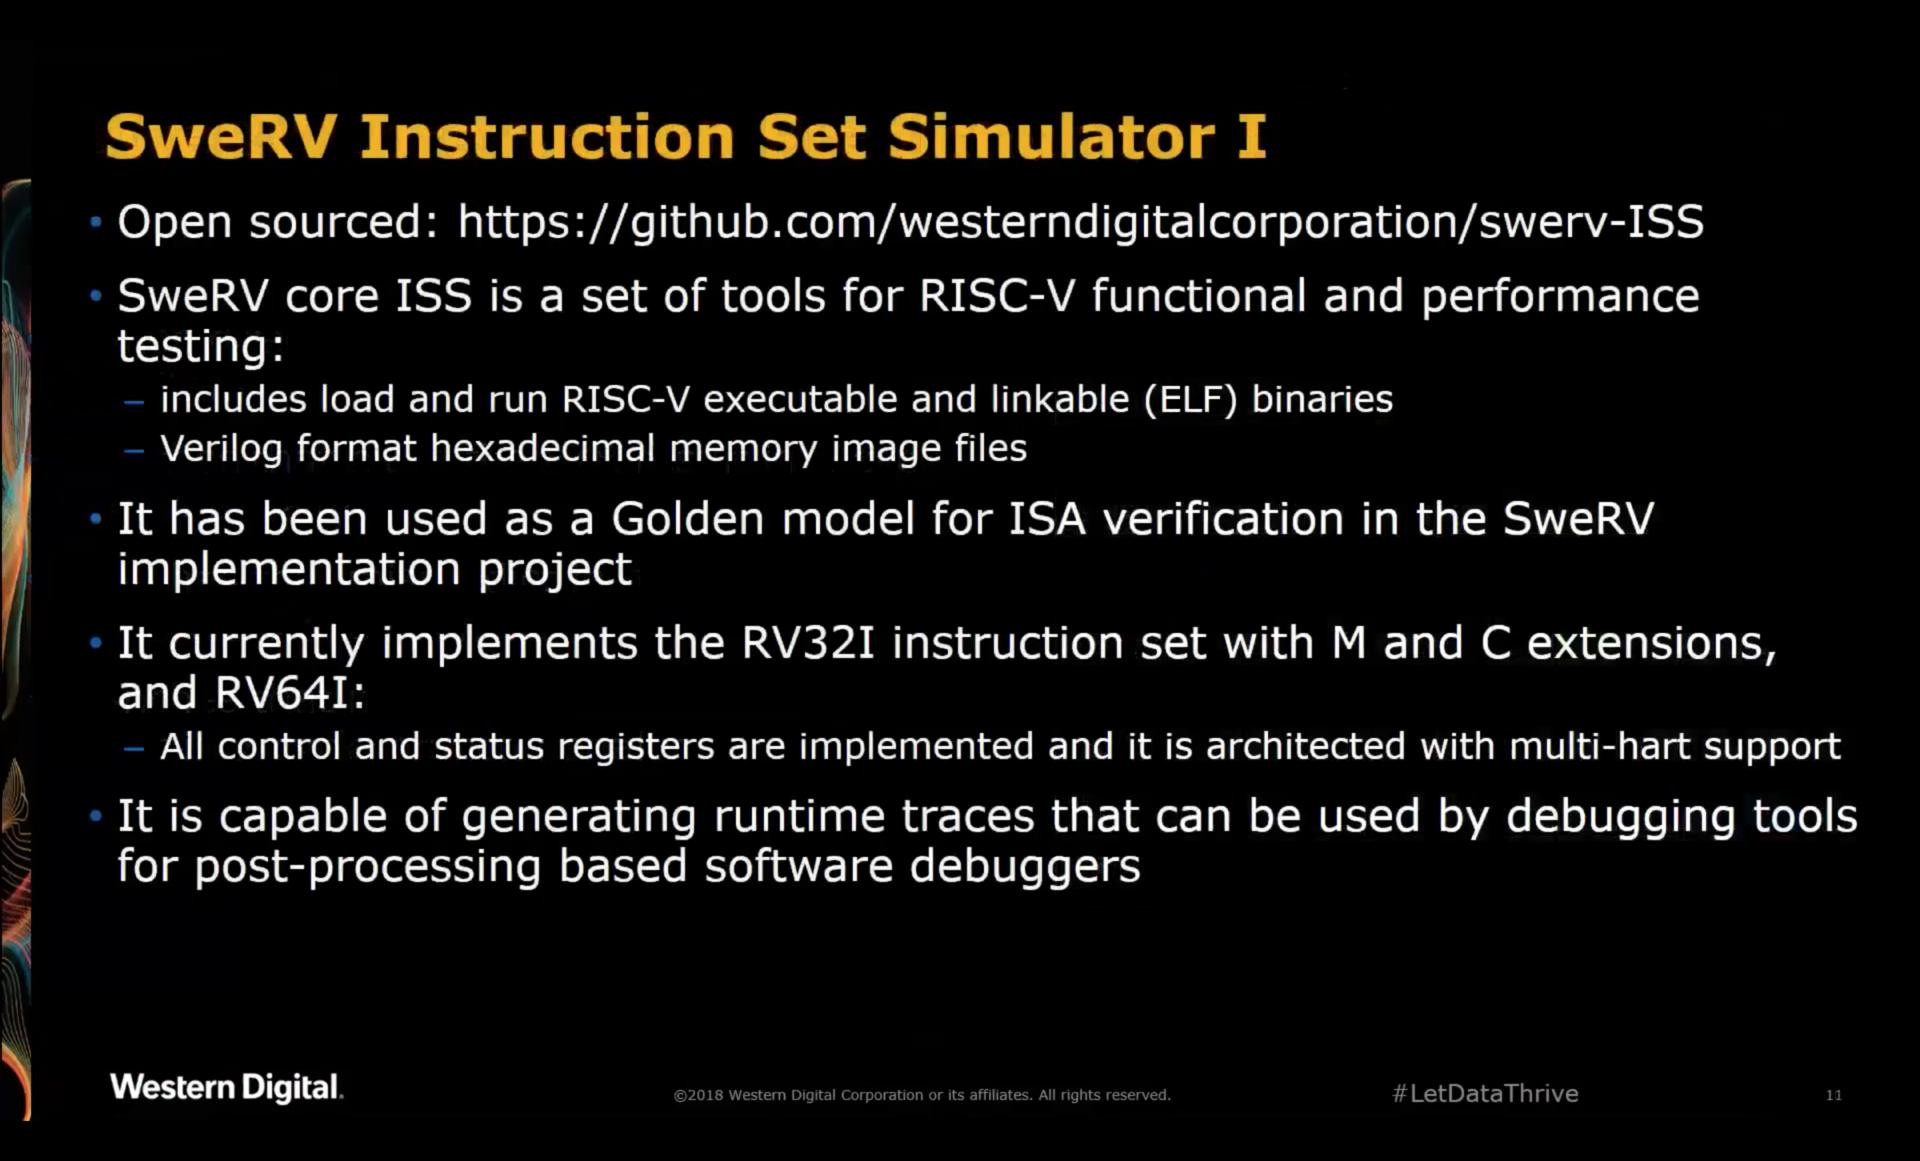 SweRV Instruction Set Simulator 1